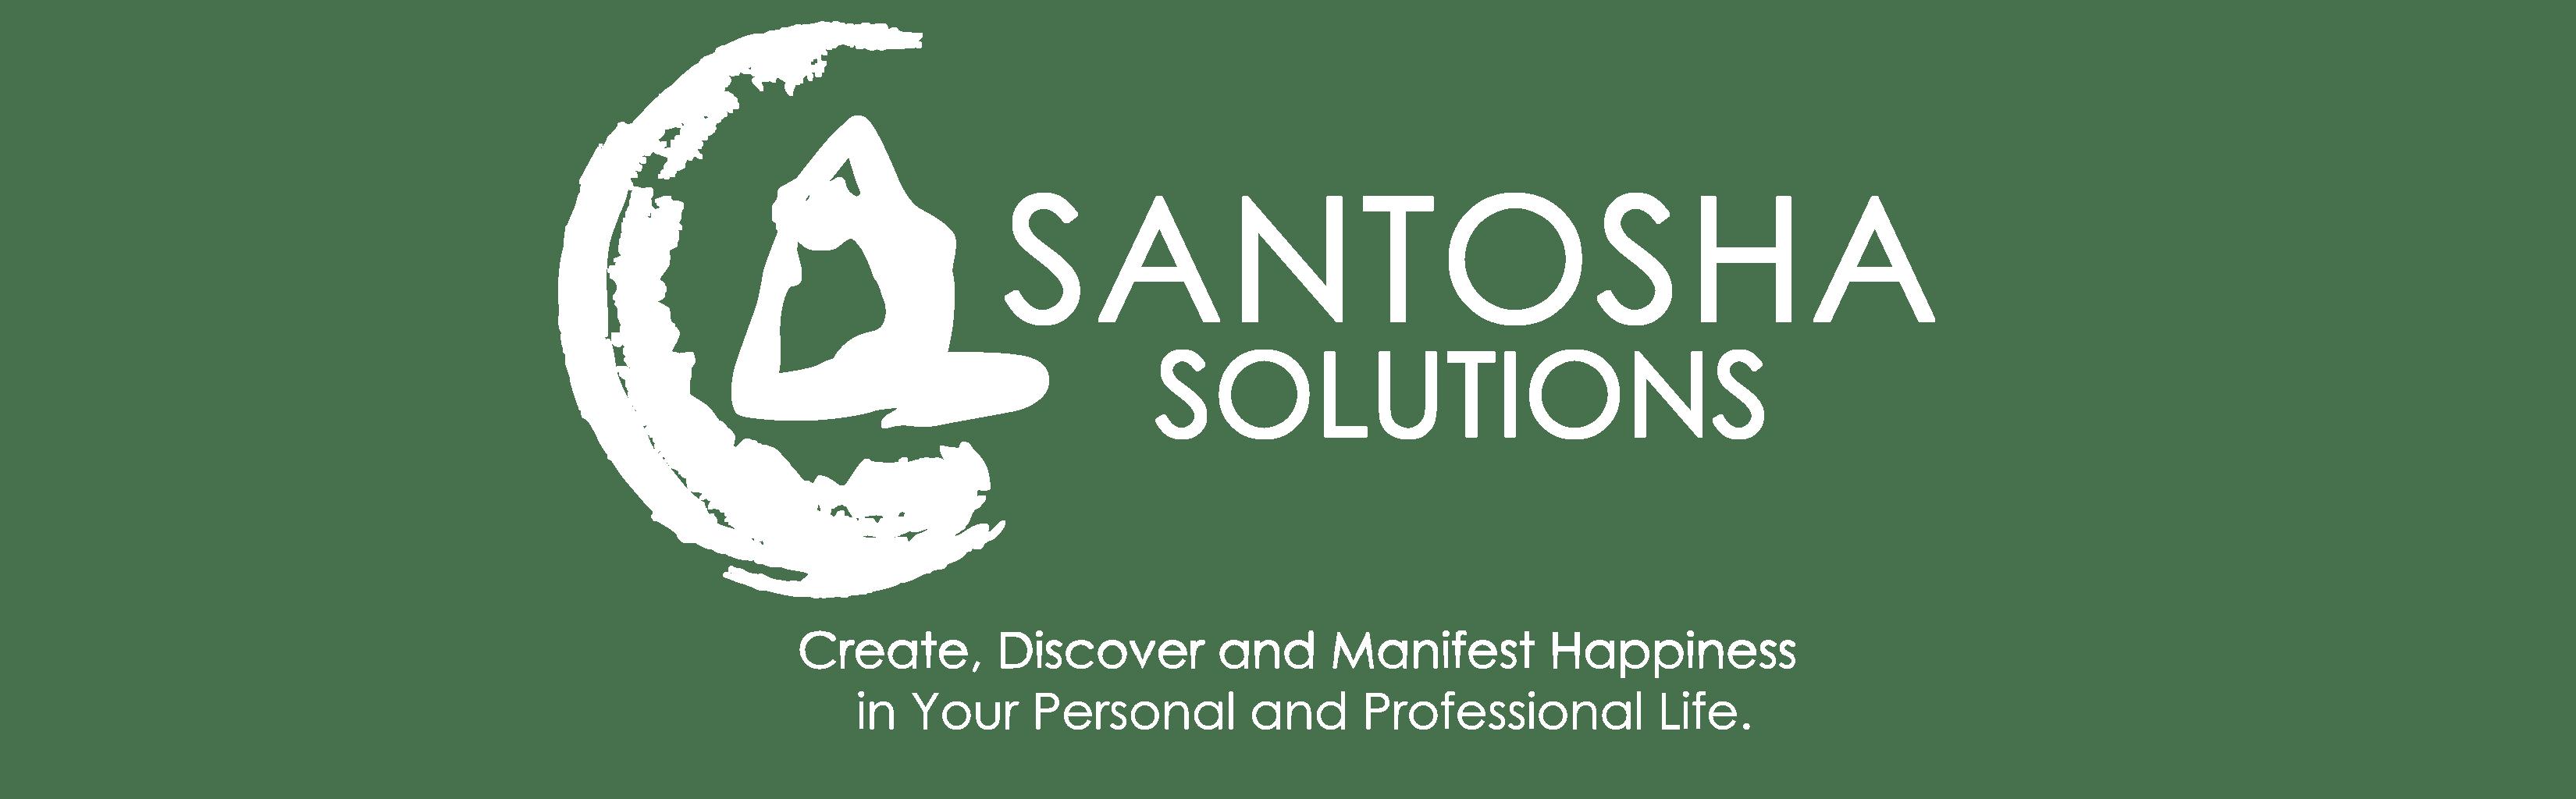 Santosha Solutions